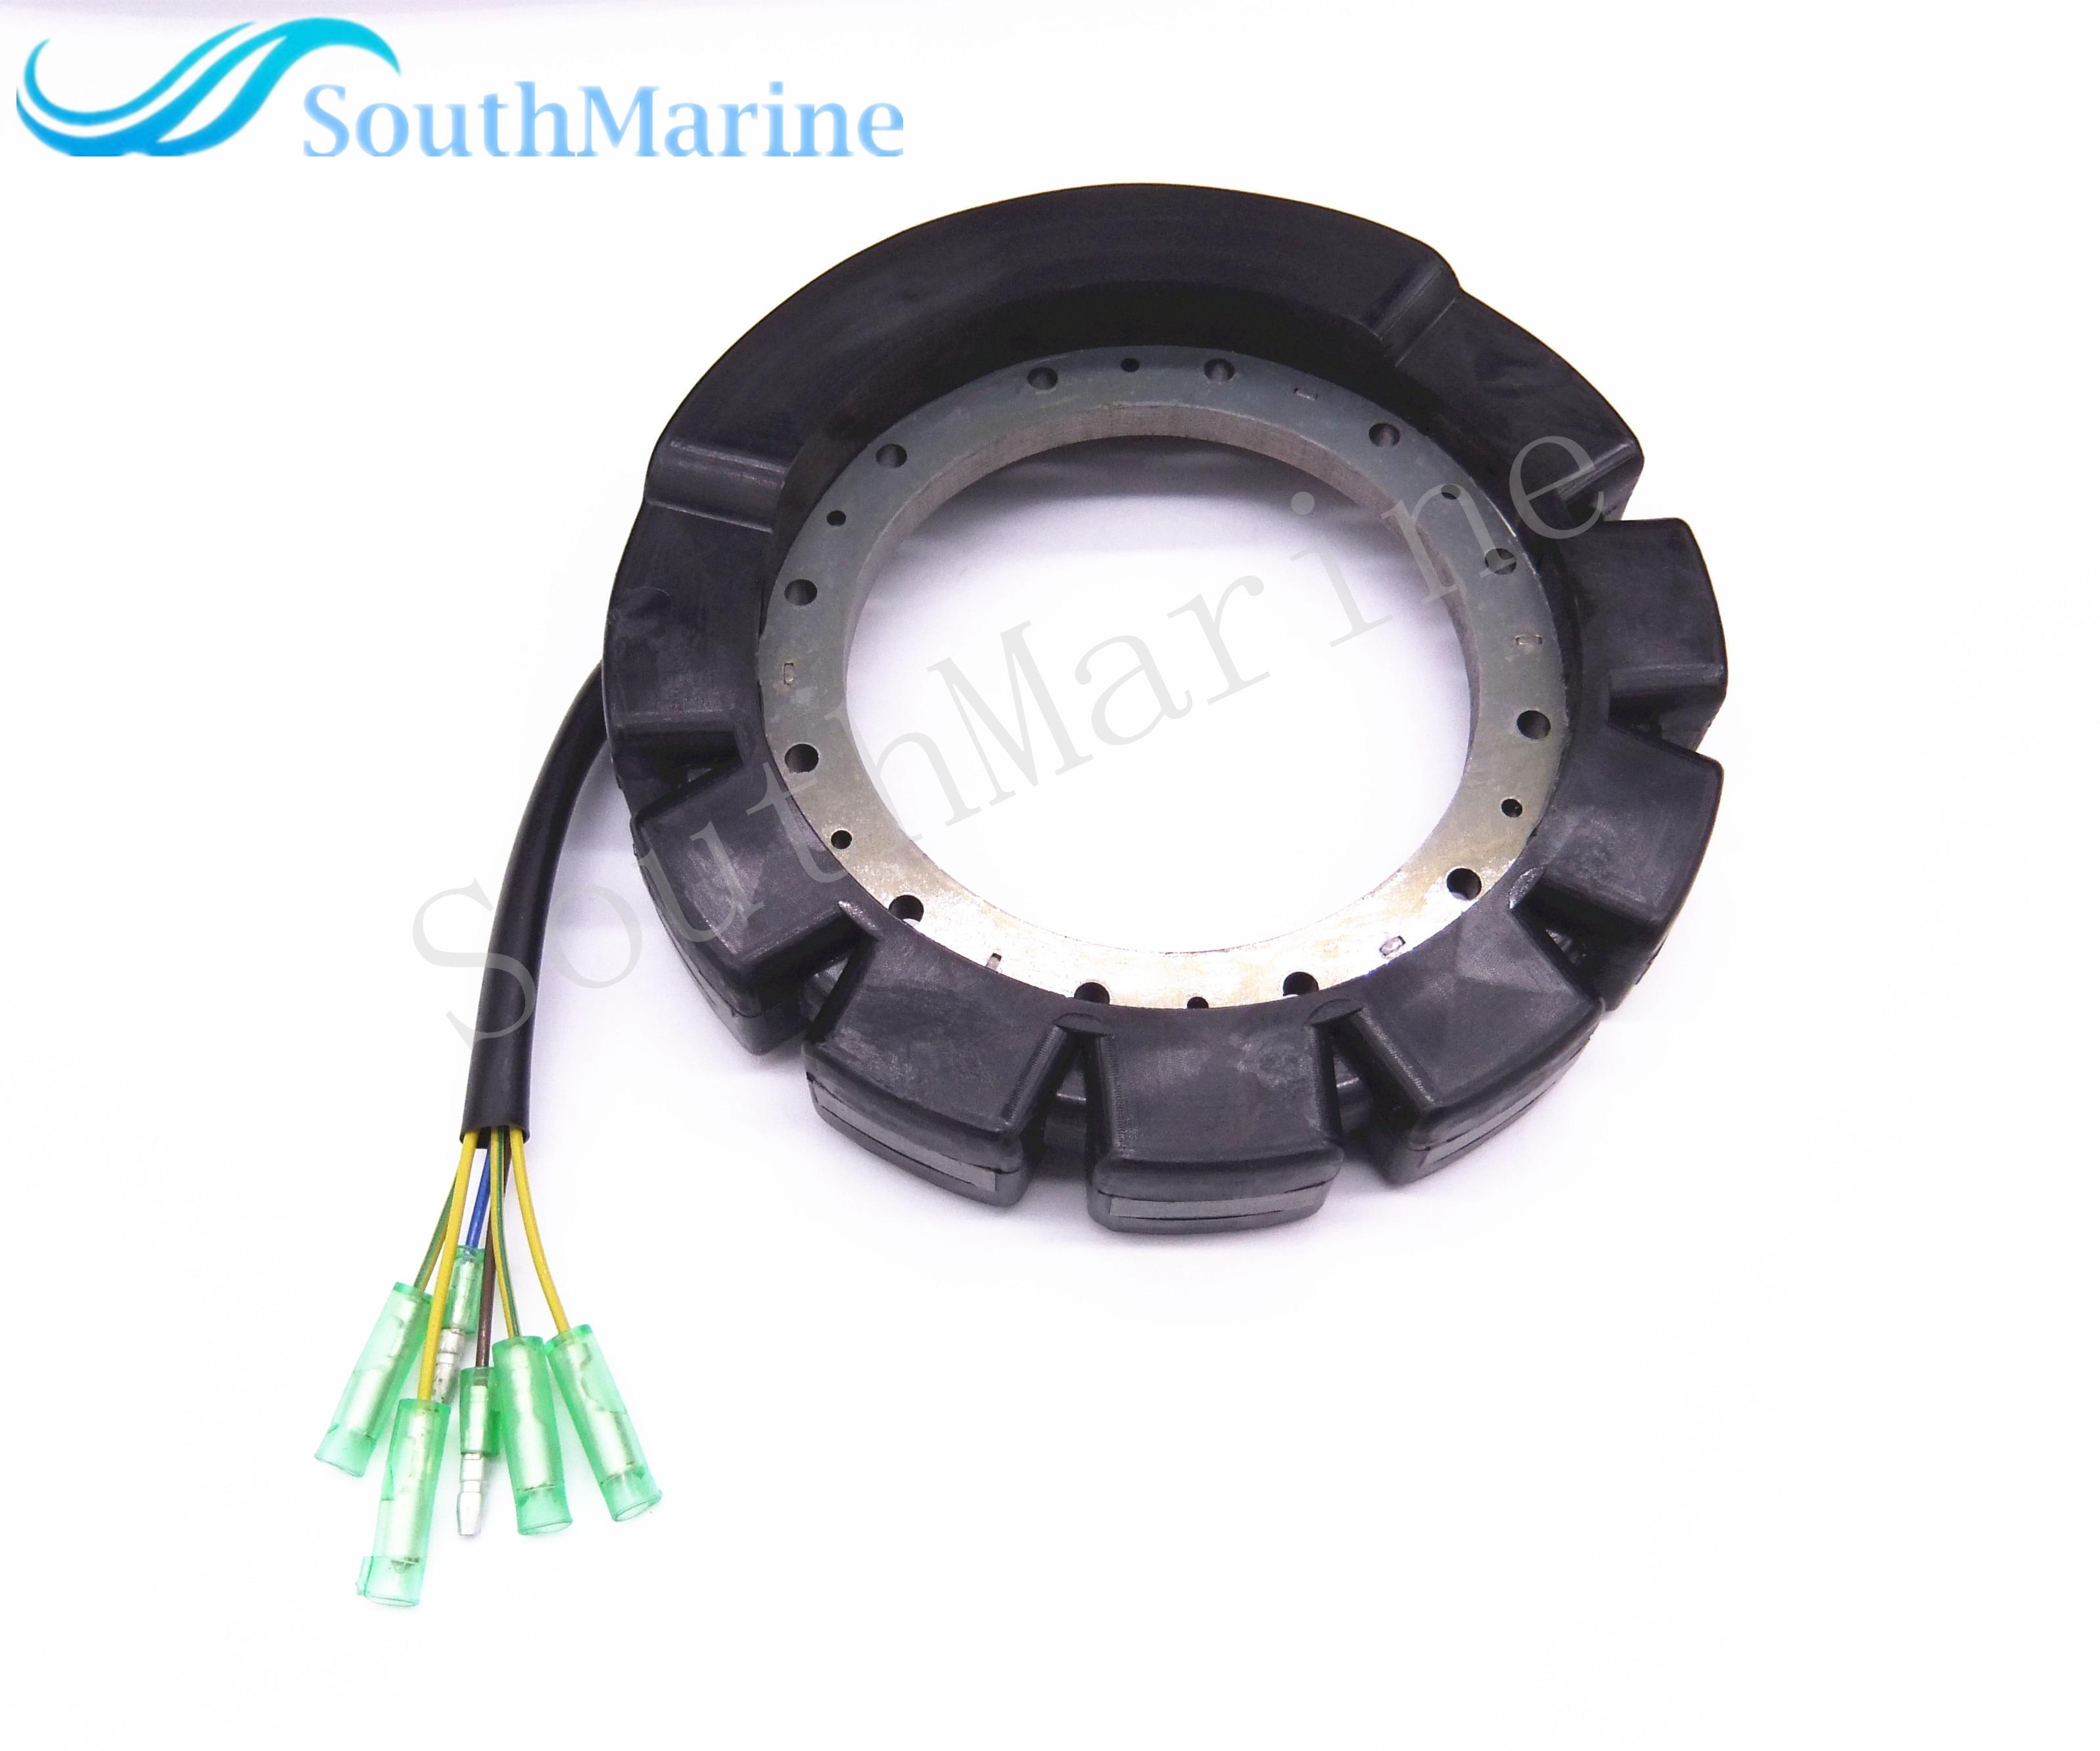 65W-85510-00 65W-85510-10 Stator assy for Yamaha Outboard Engine 4-Stroke F25 F40